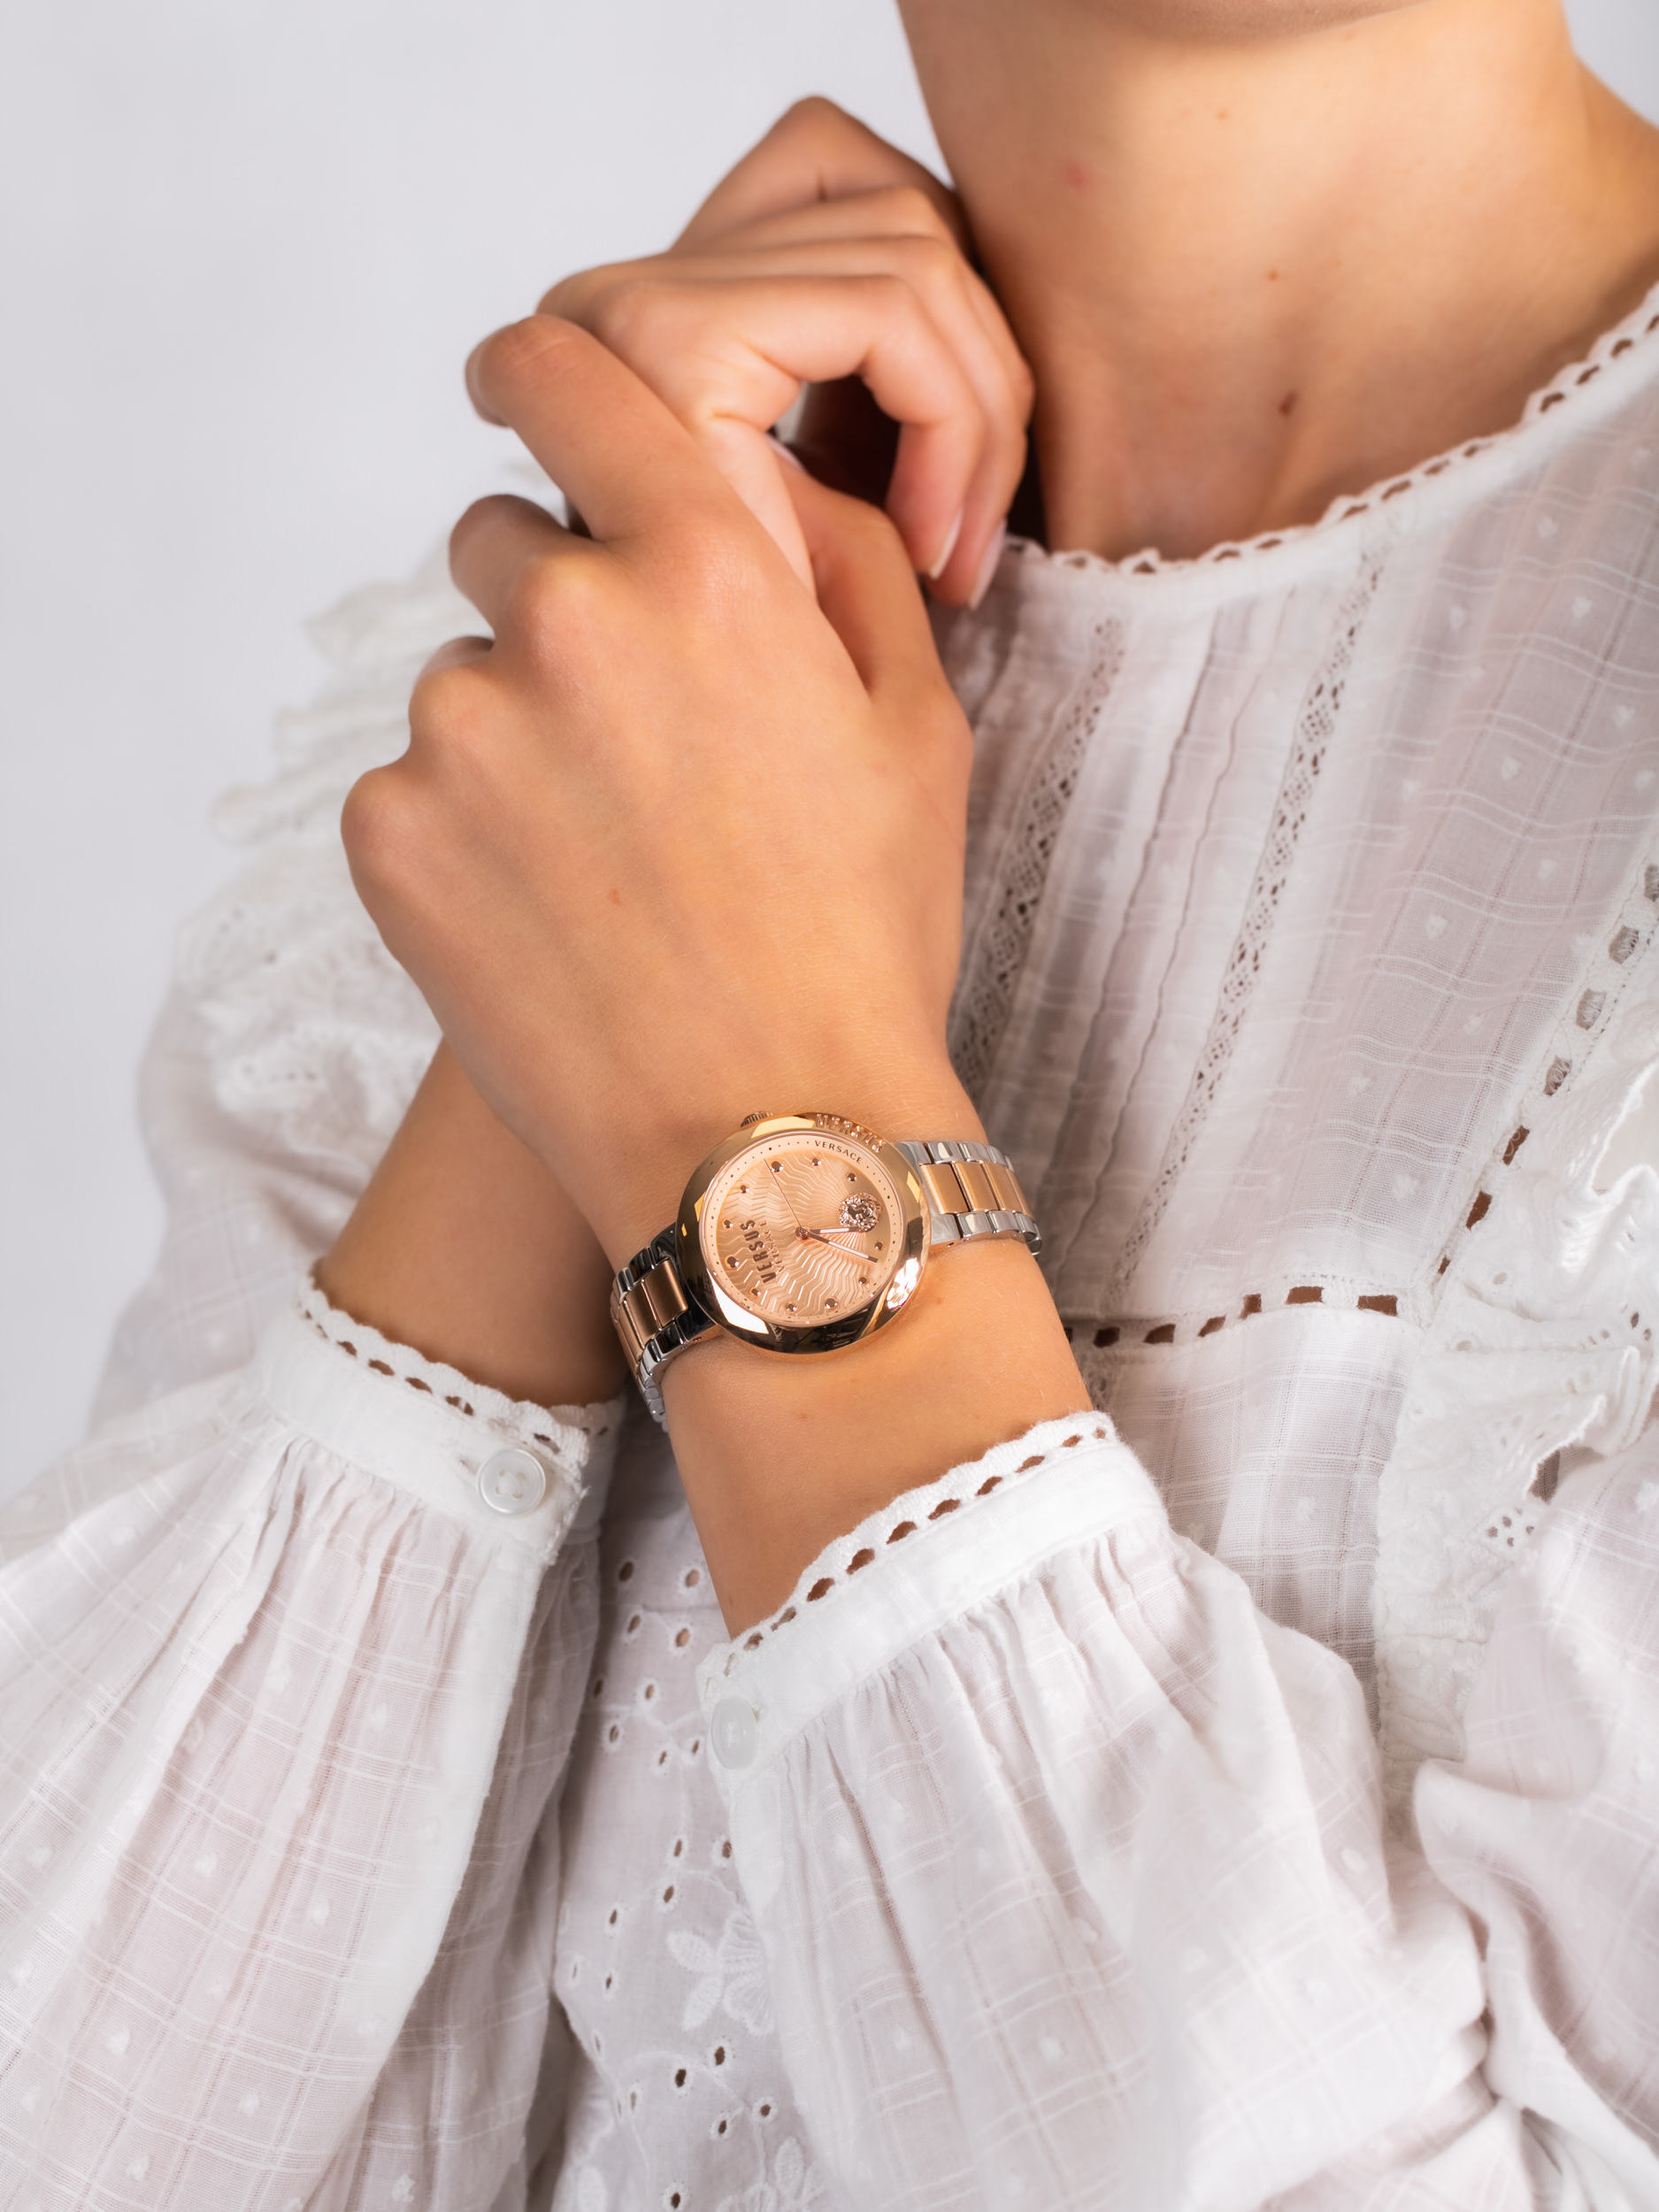 Versus Versace VSP370617 damski zegarek Damskie bransoleta